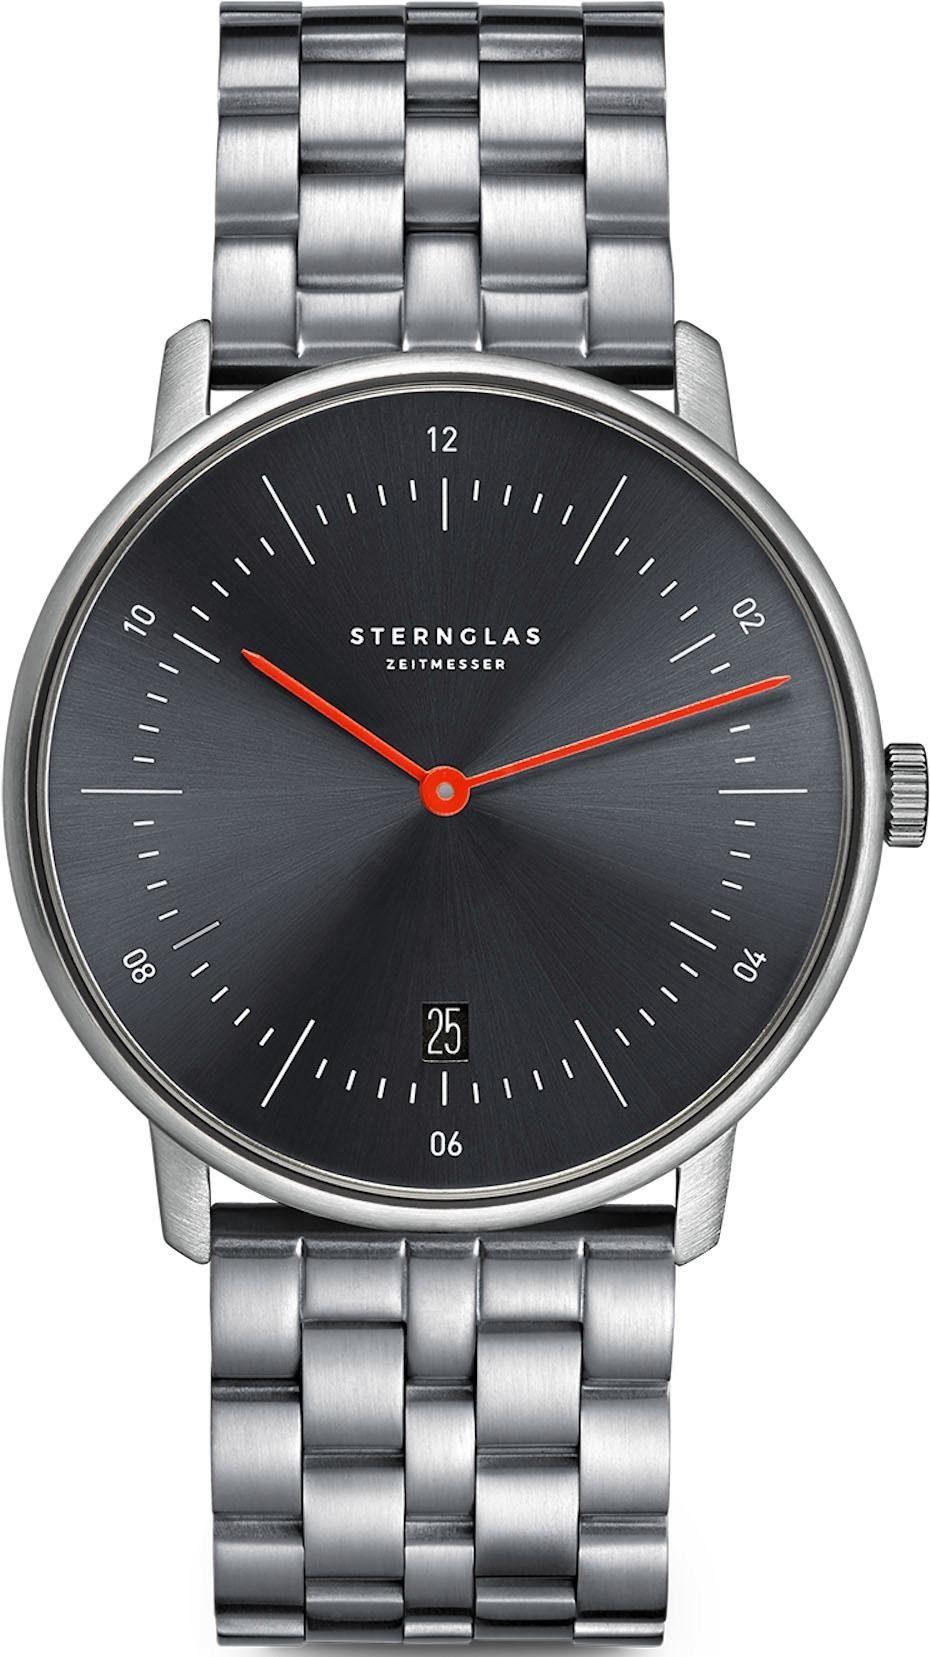 STERNGLAS Quarzuhr Naos Edition Basalt SNQ41/500   Uhren   Sternglas